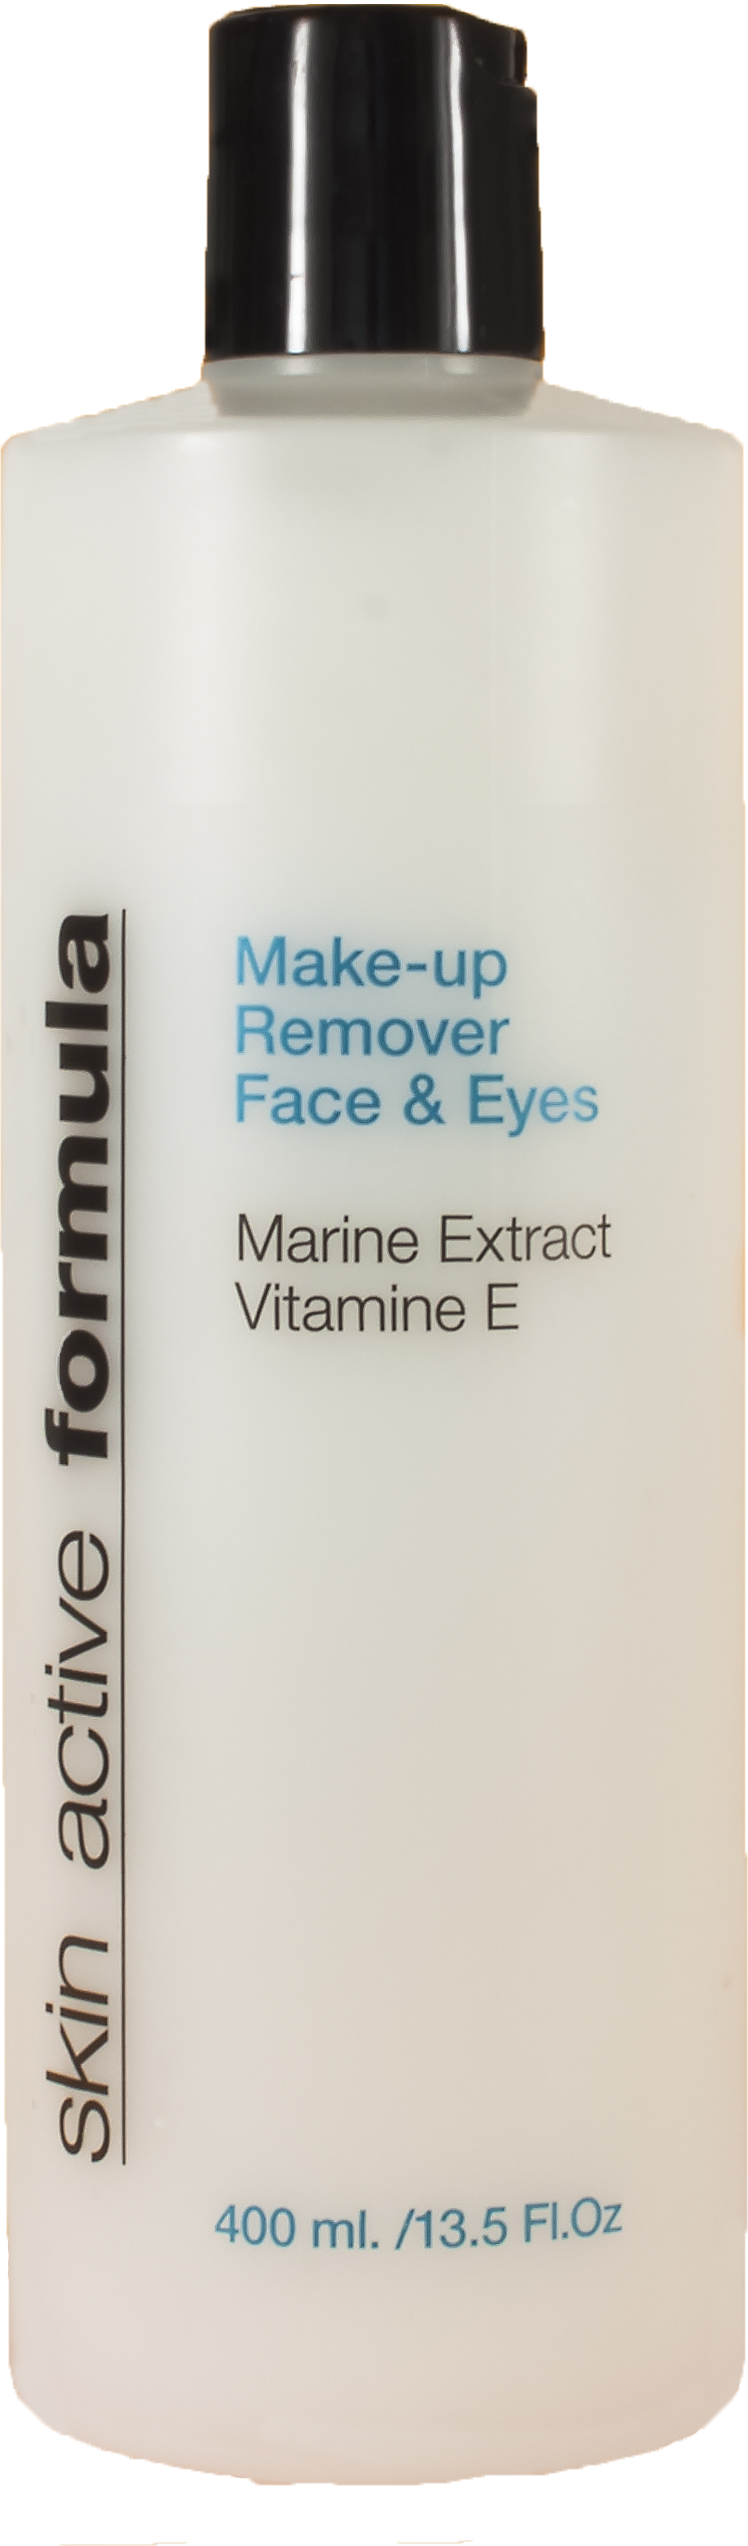 Skin Active Formula Make-Up Remover 400 ml – Face & Eyes – Marine Extract – Vitamin E